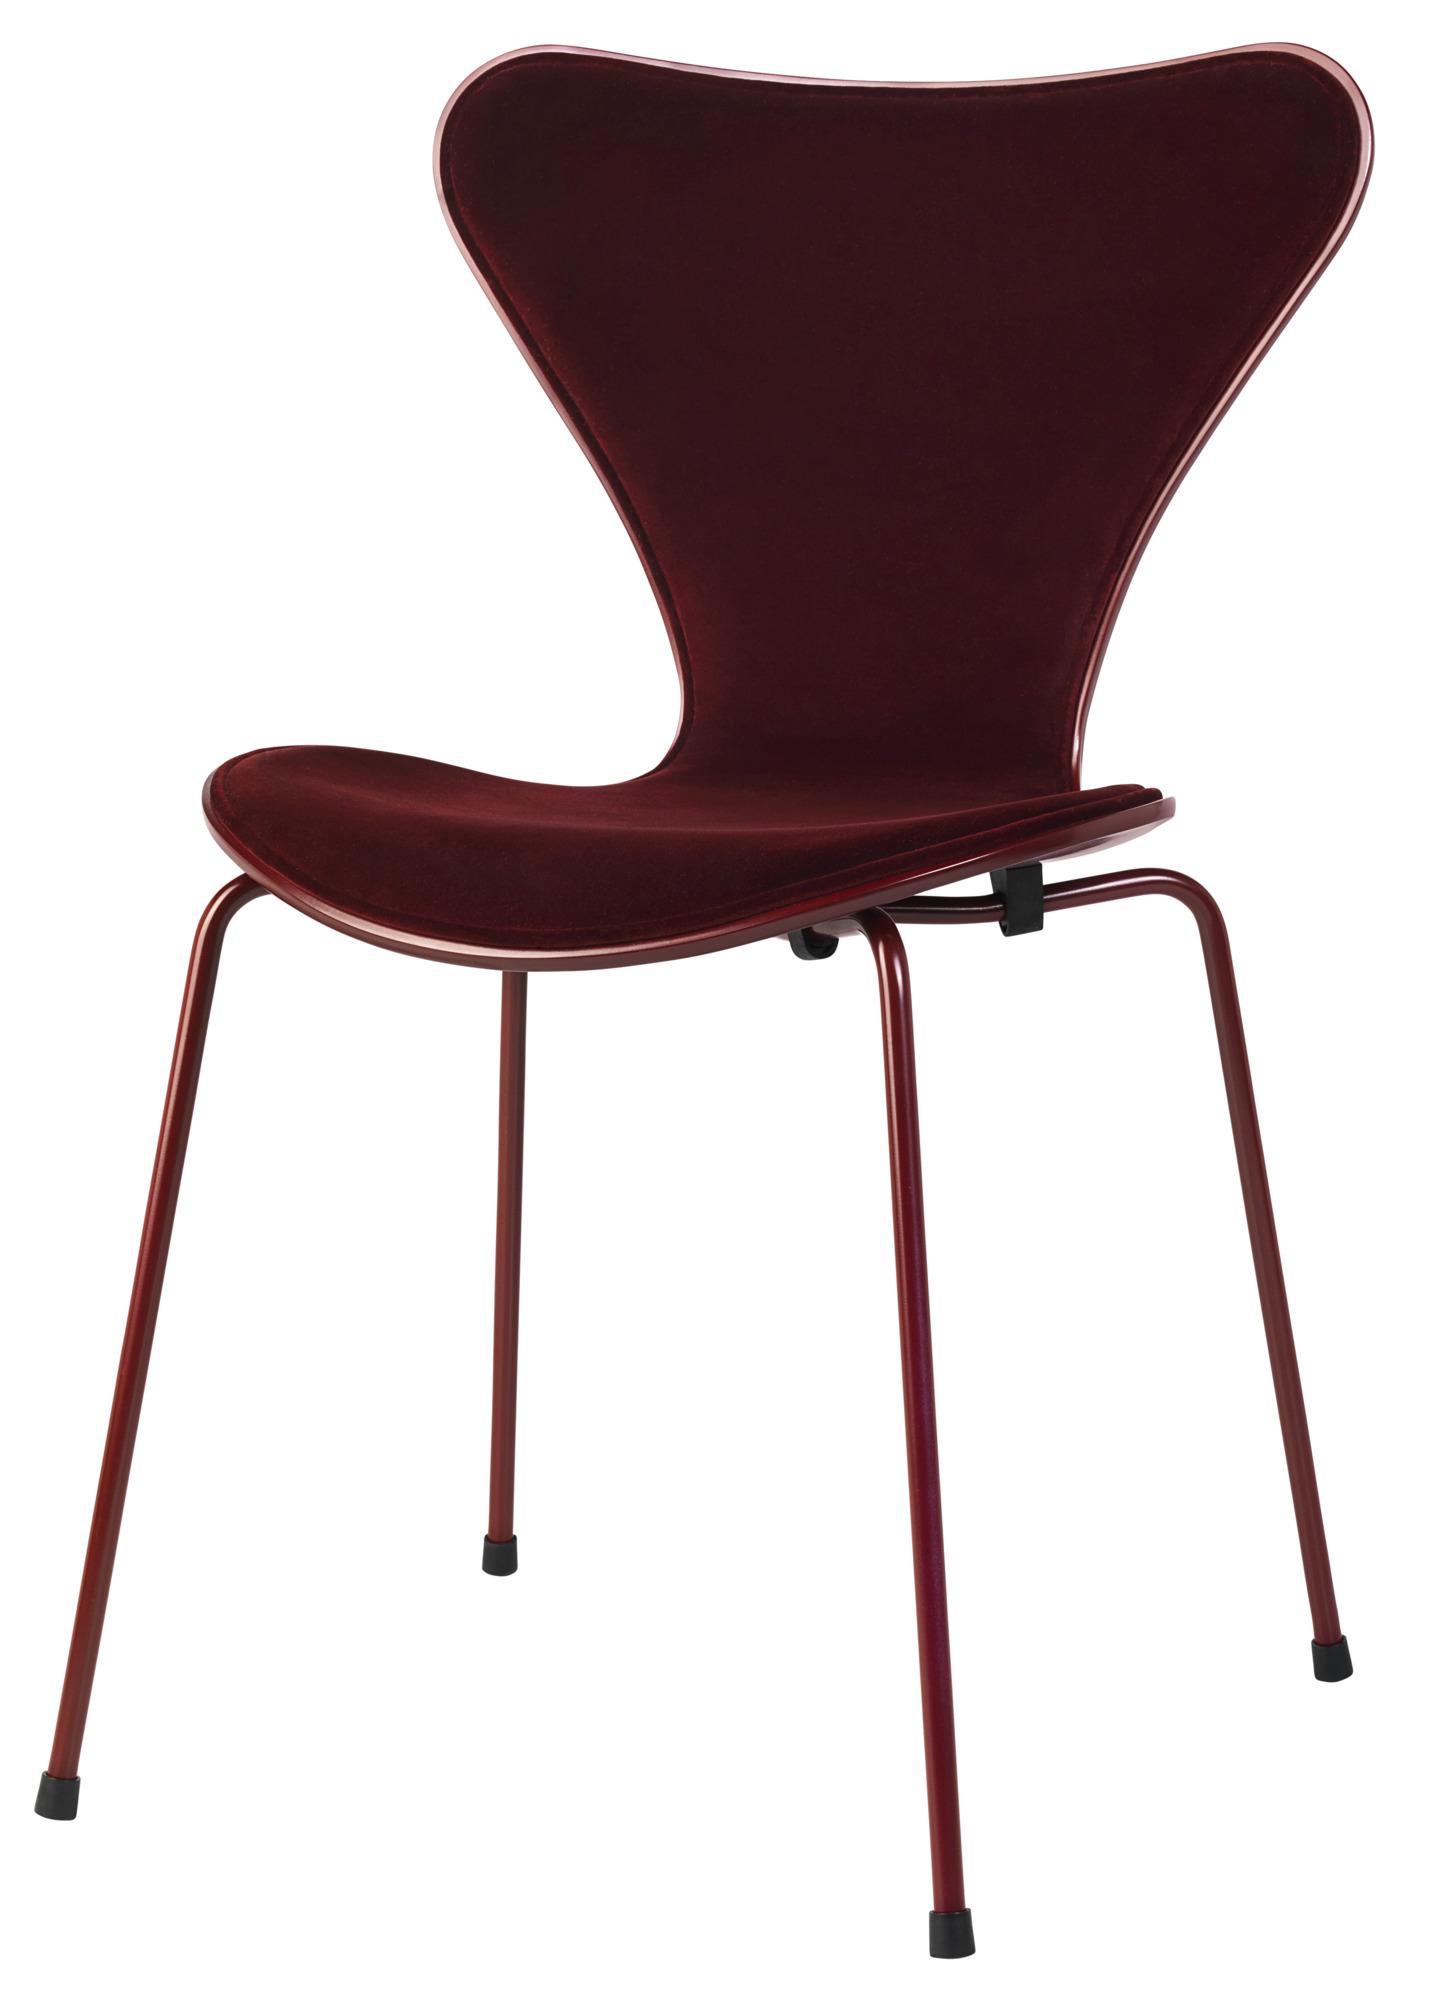 Serie 7 Stuhl Miniatur opium rot Fritz Hansen